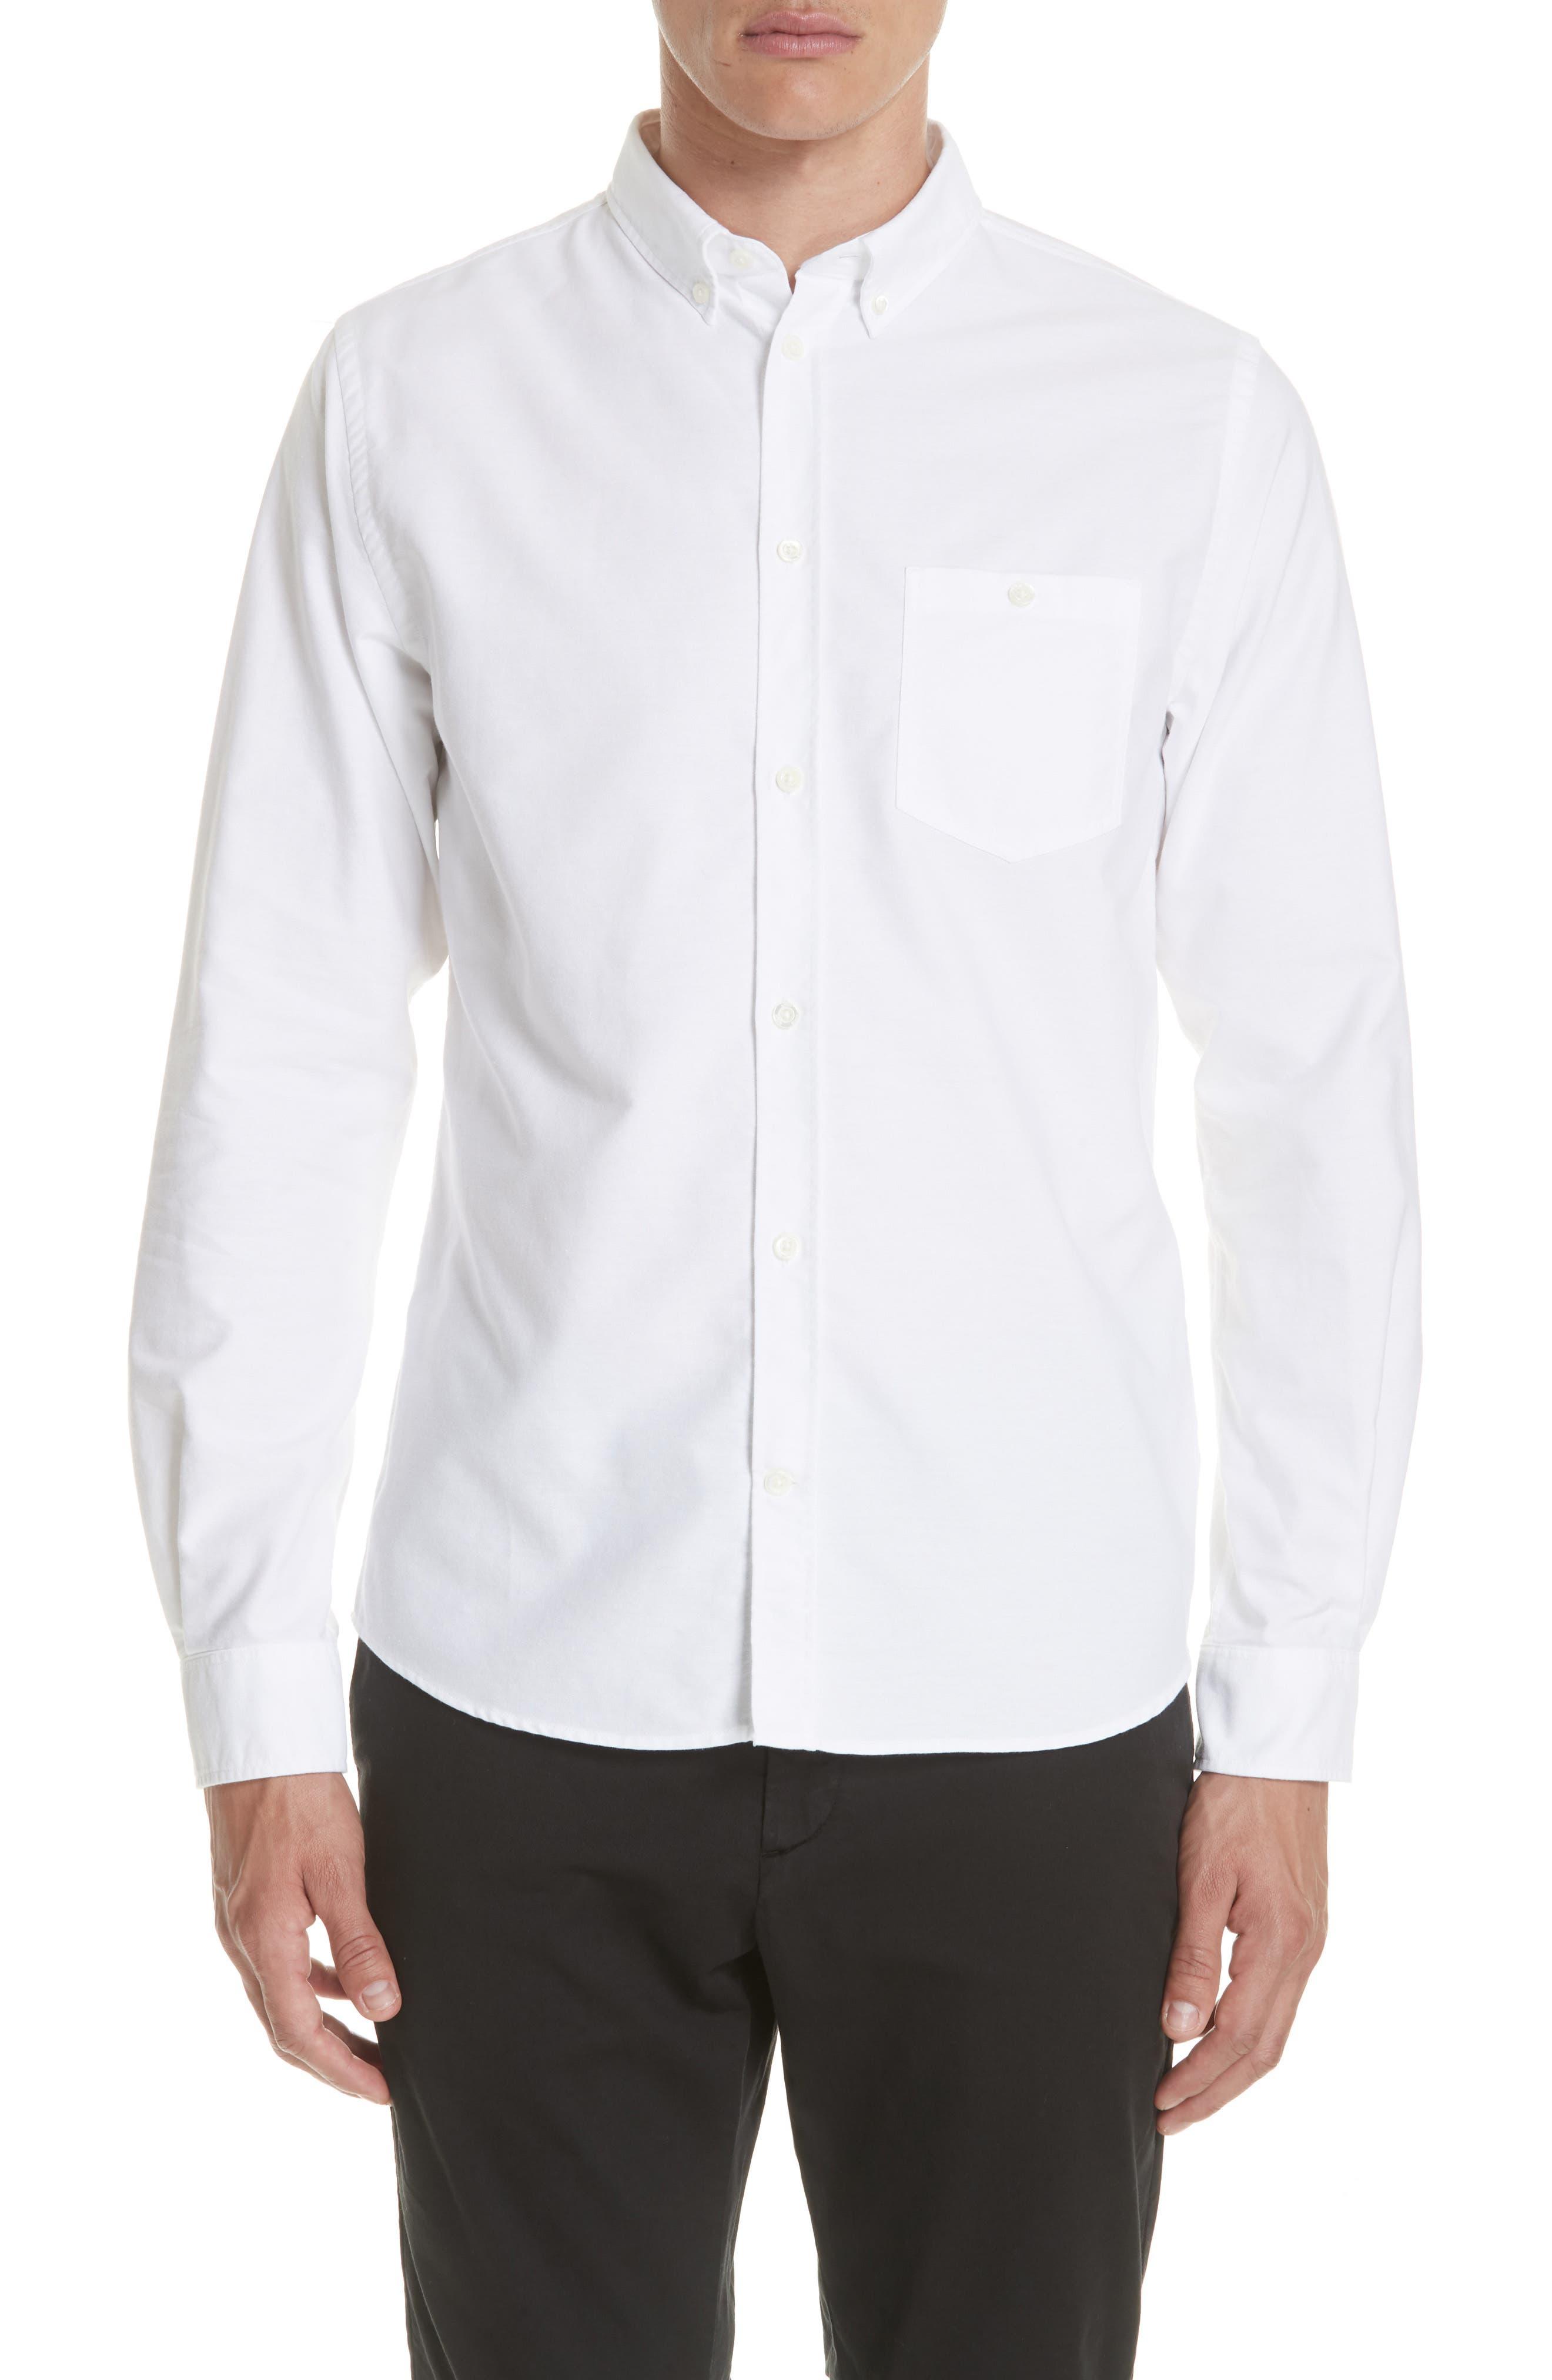 Anton Oxford Sport Shirt,                             Main thumbnail 1, color,                             100